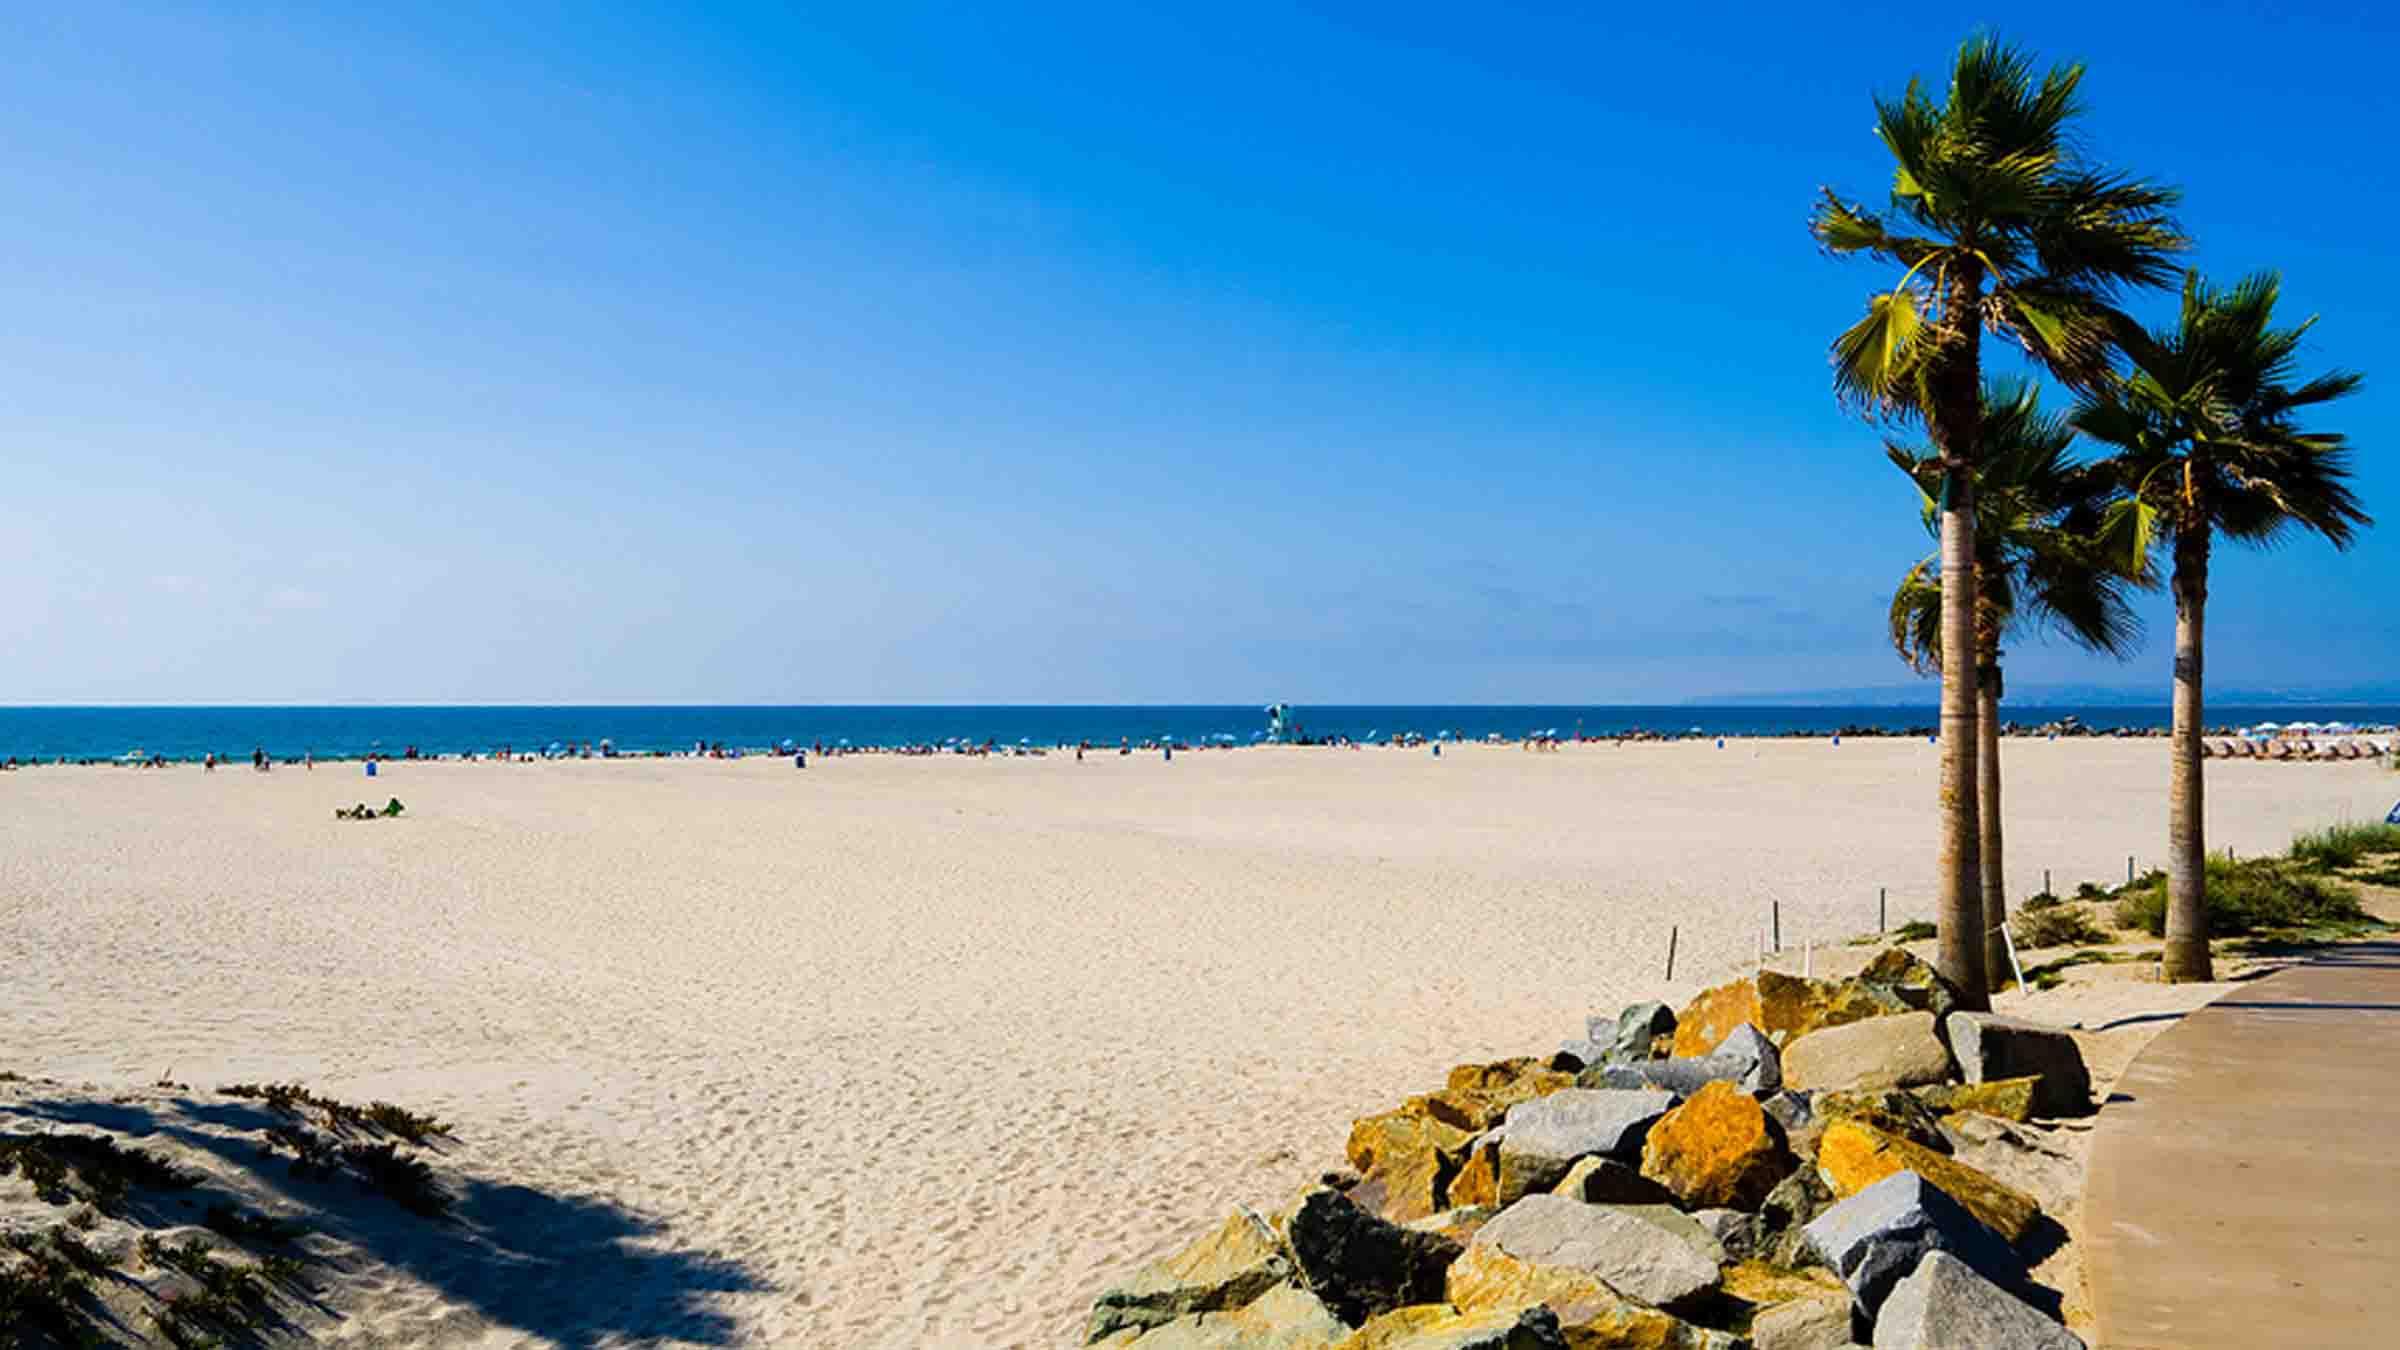 Pa Directory Chula Vista Beach Coastline Donate Car Jpg